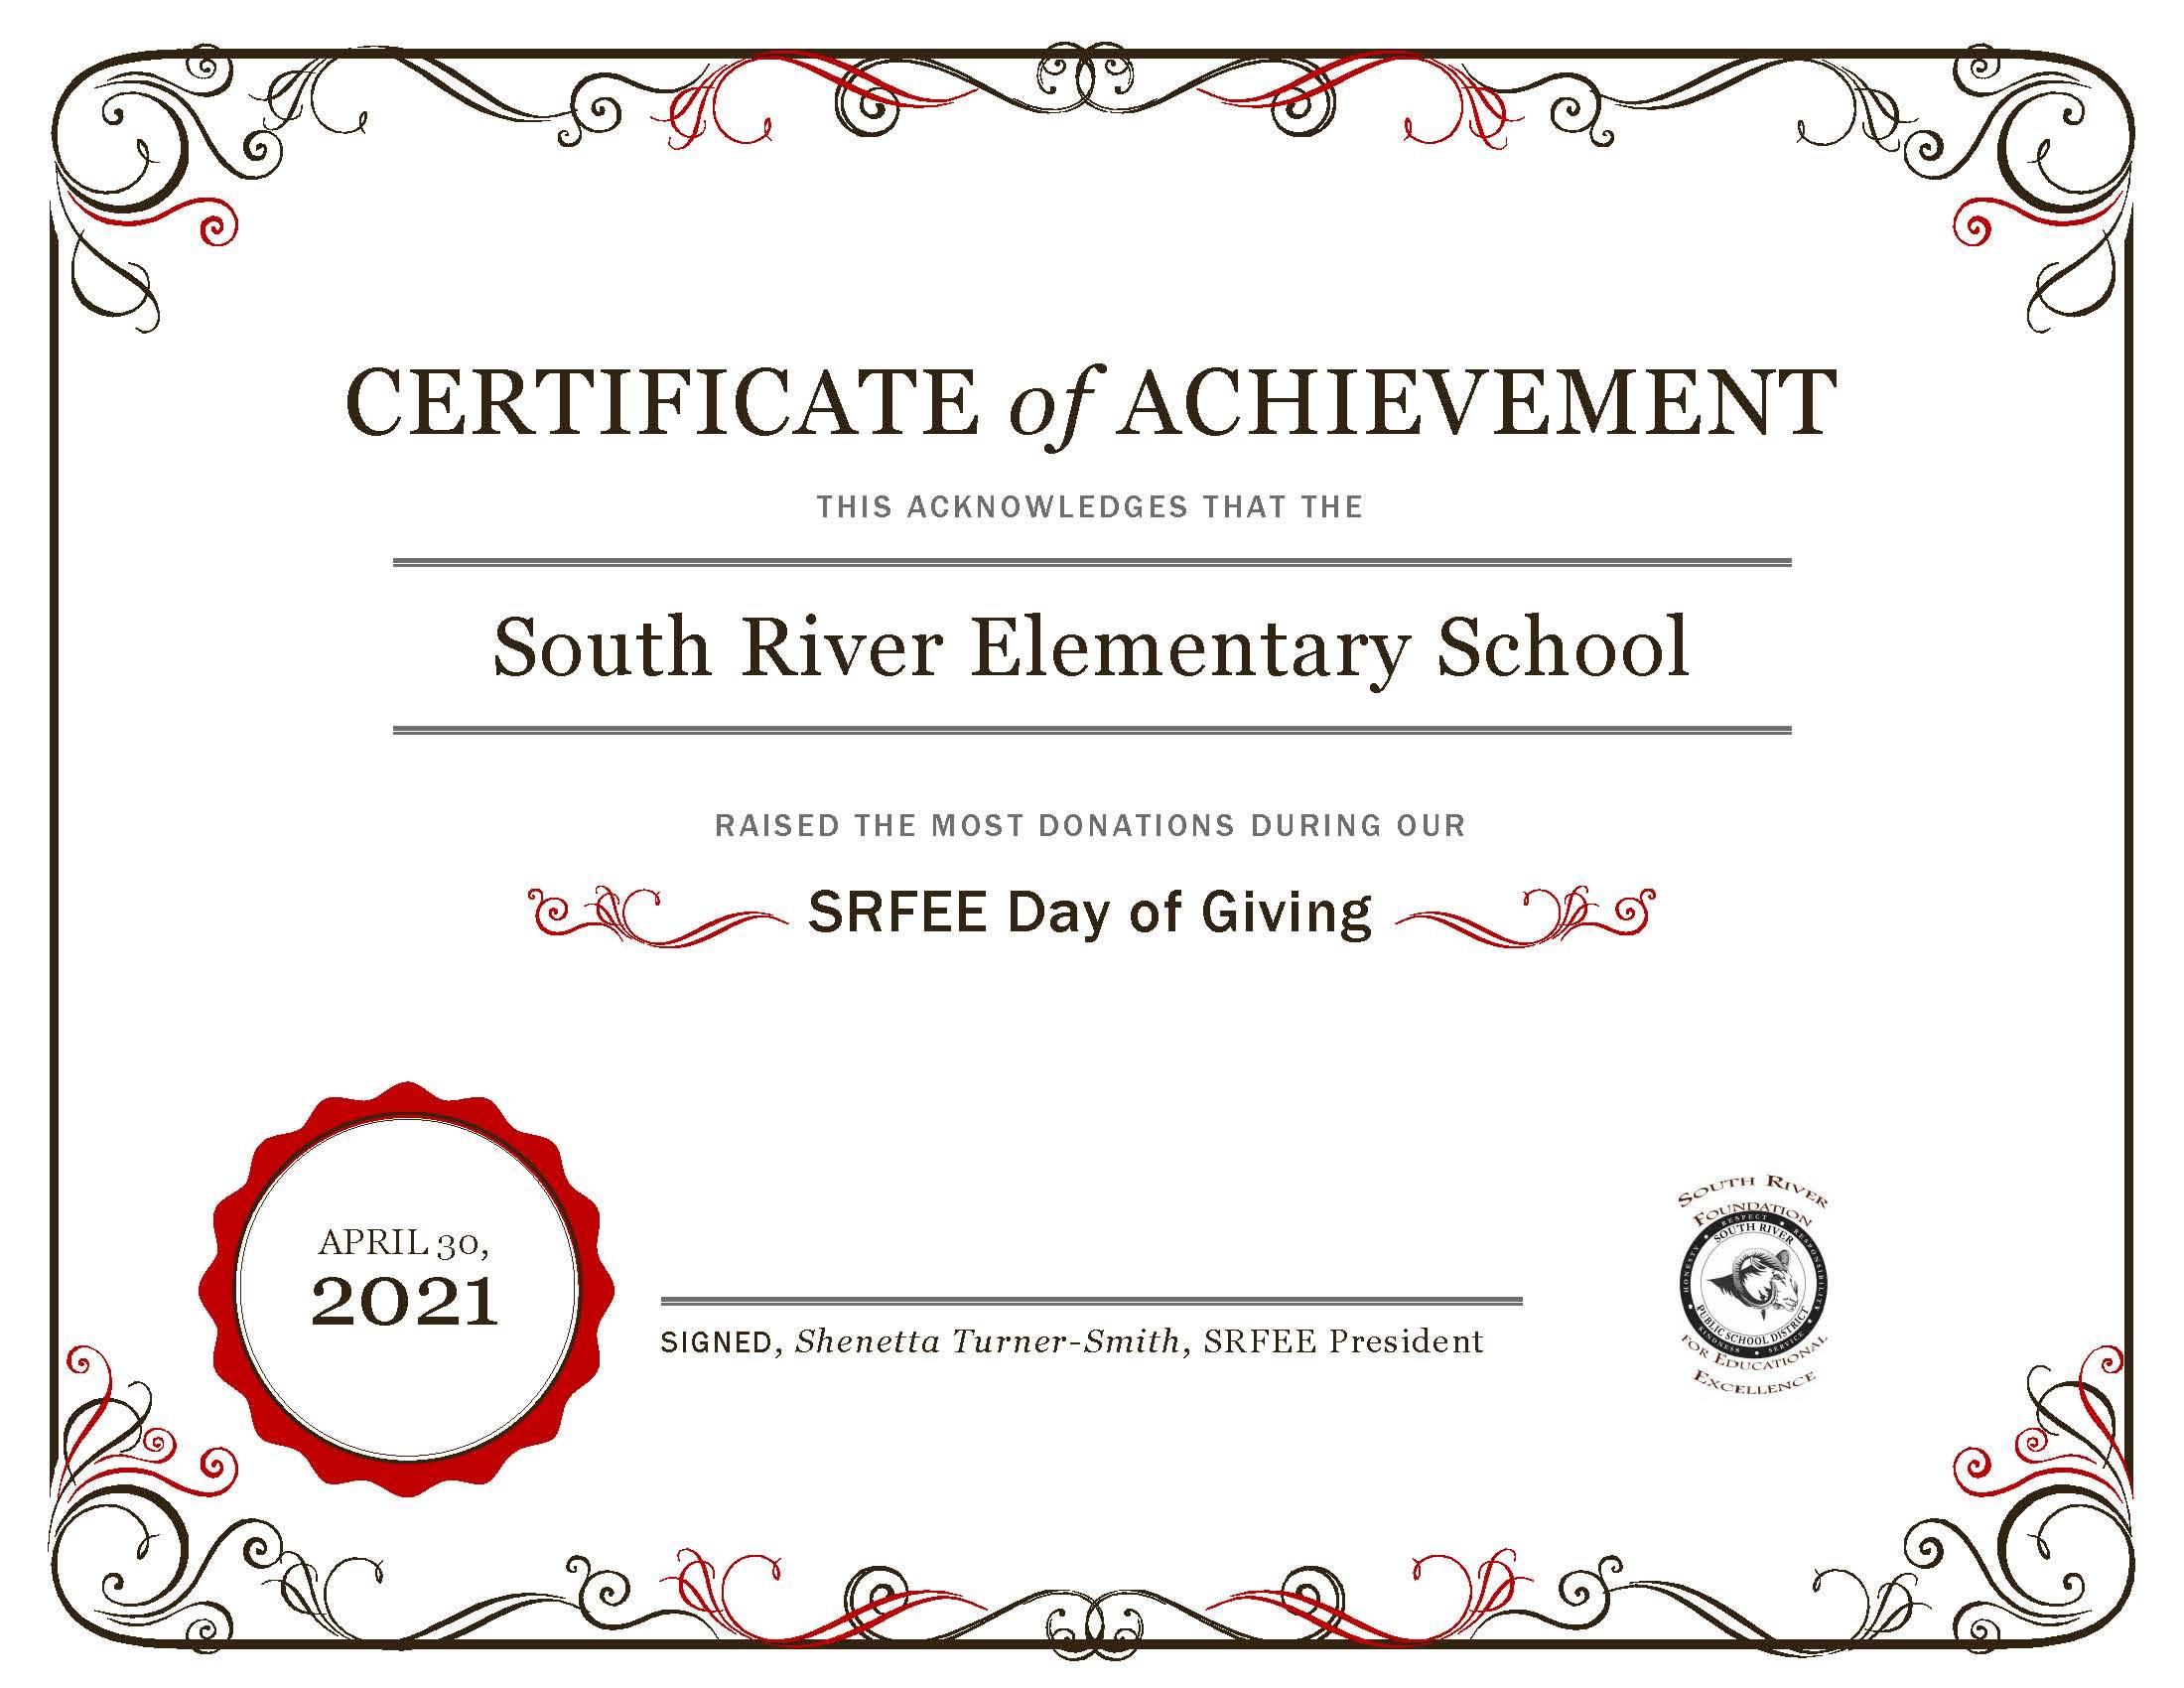 2021 SRFEE Day of Giving Elementary School Certificate of Appreciation